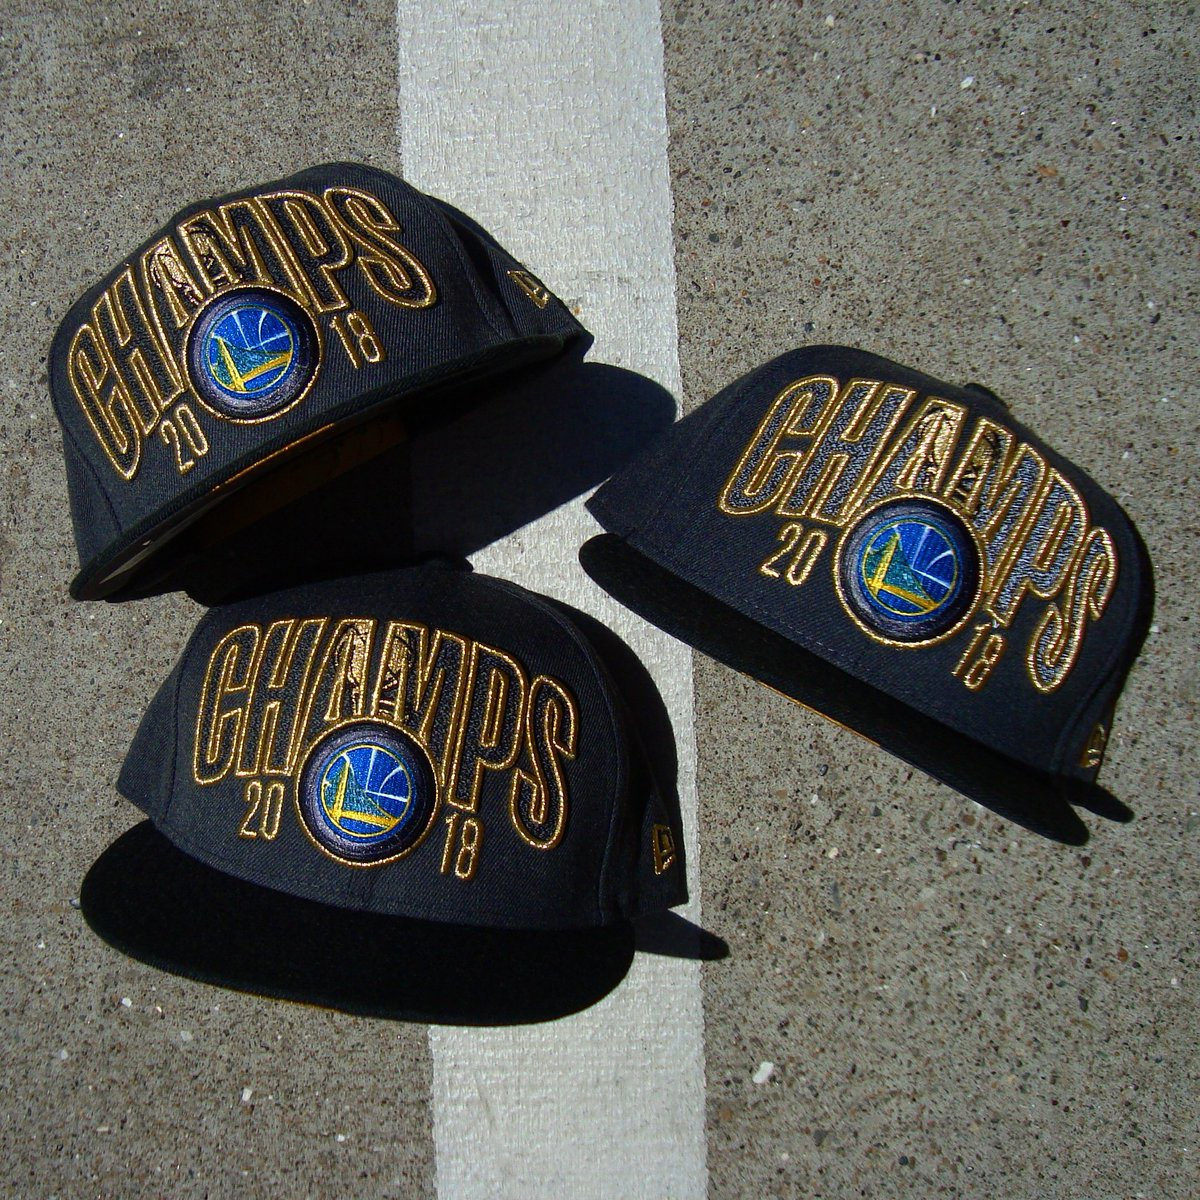 a3dffcc59da09a Giants Dugout Store on Twitter: